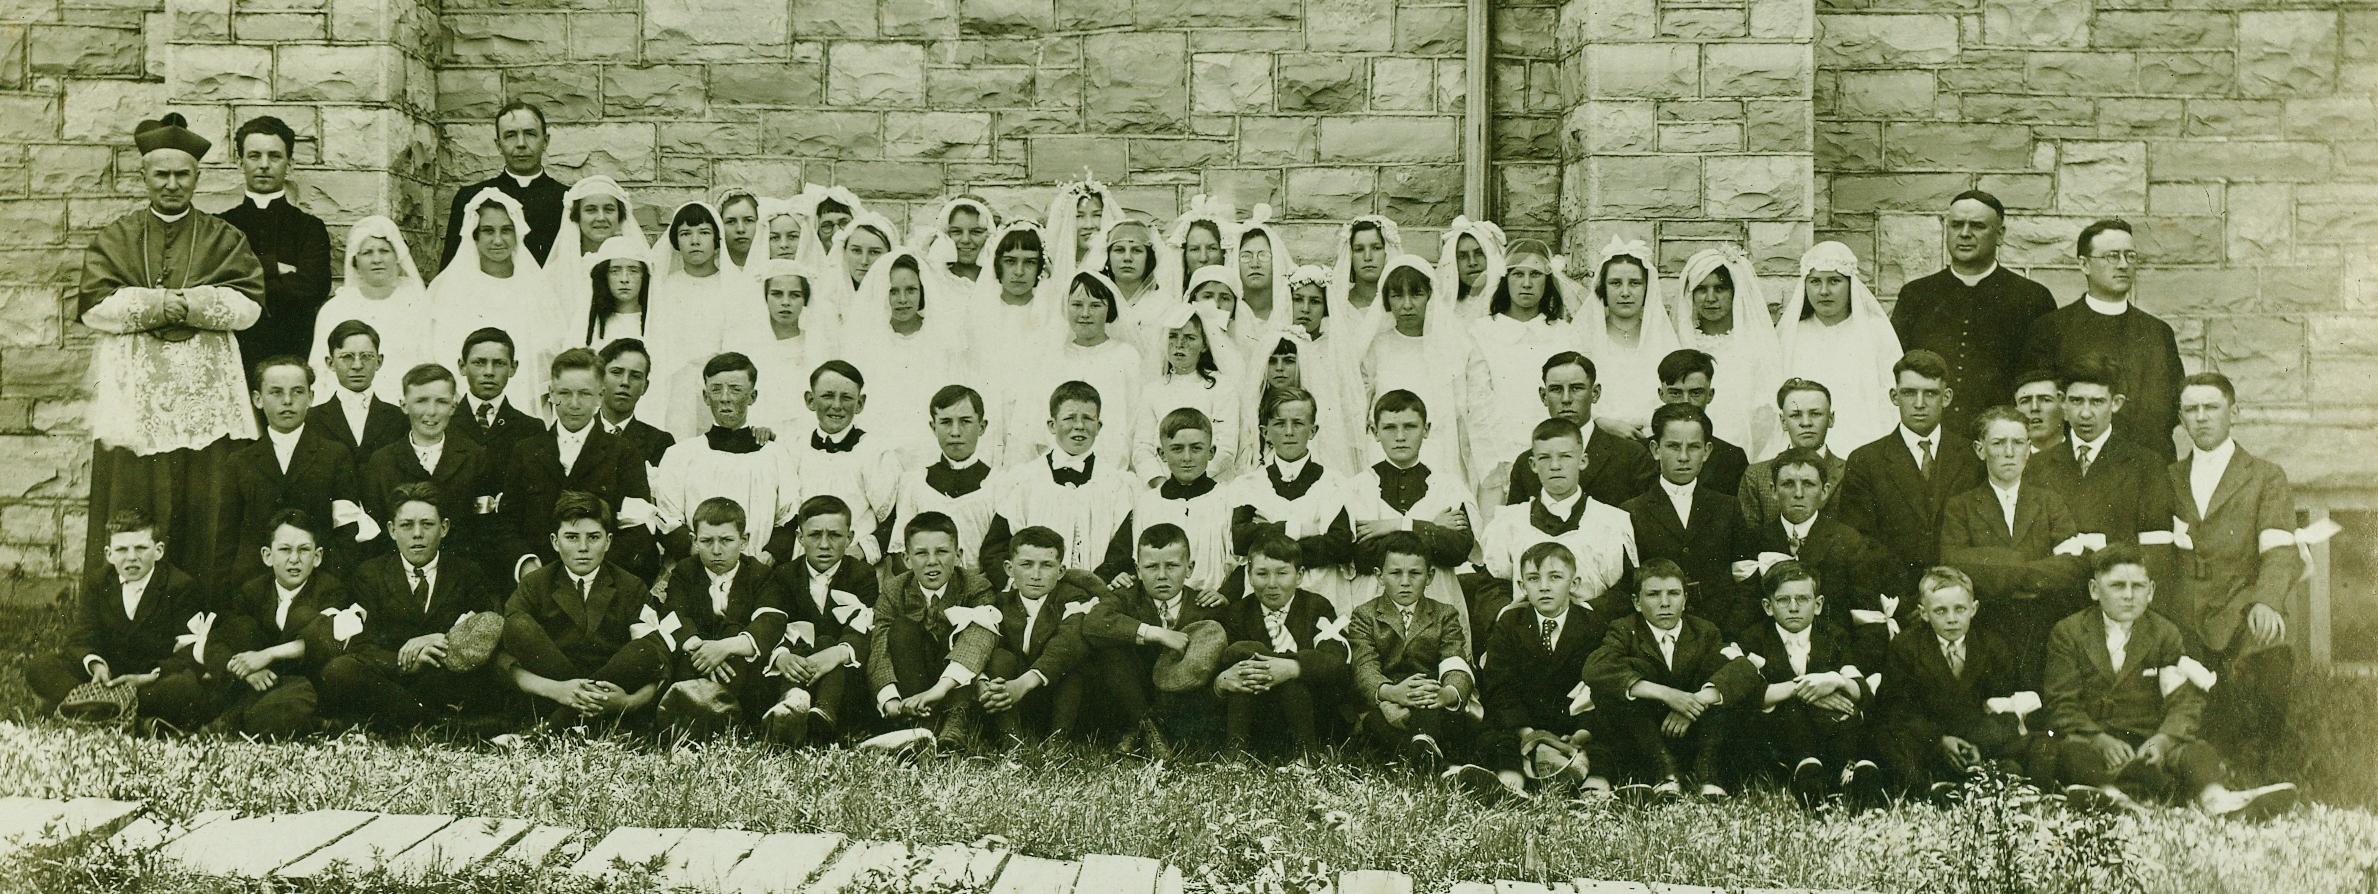 Sacred Heart Confirmation class, Father O'Reilly's time, ArchBishop Spratt, Father Corrigan, circa 1926